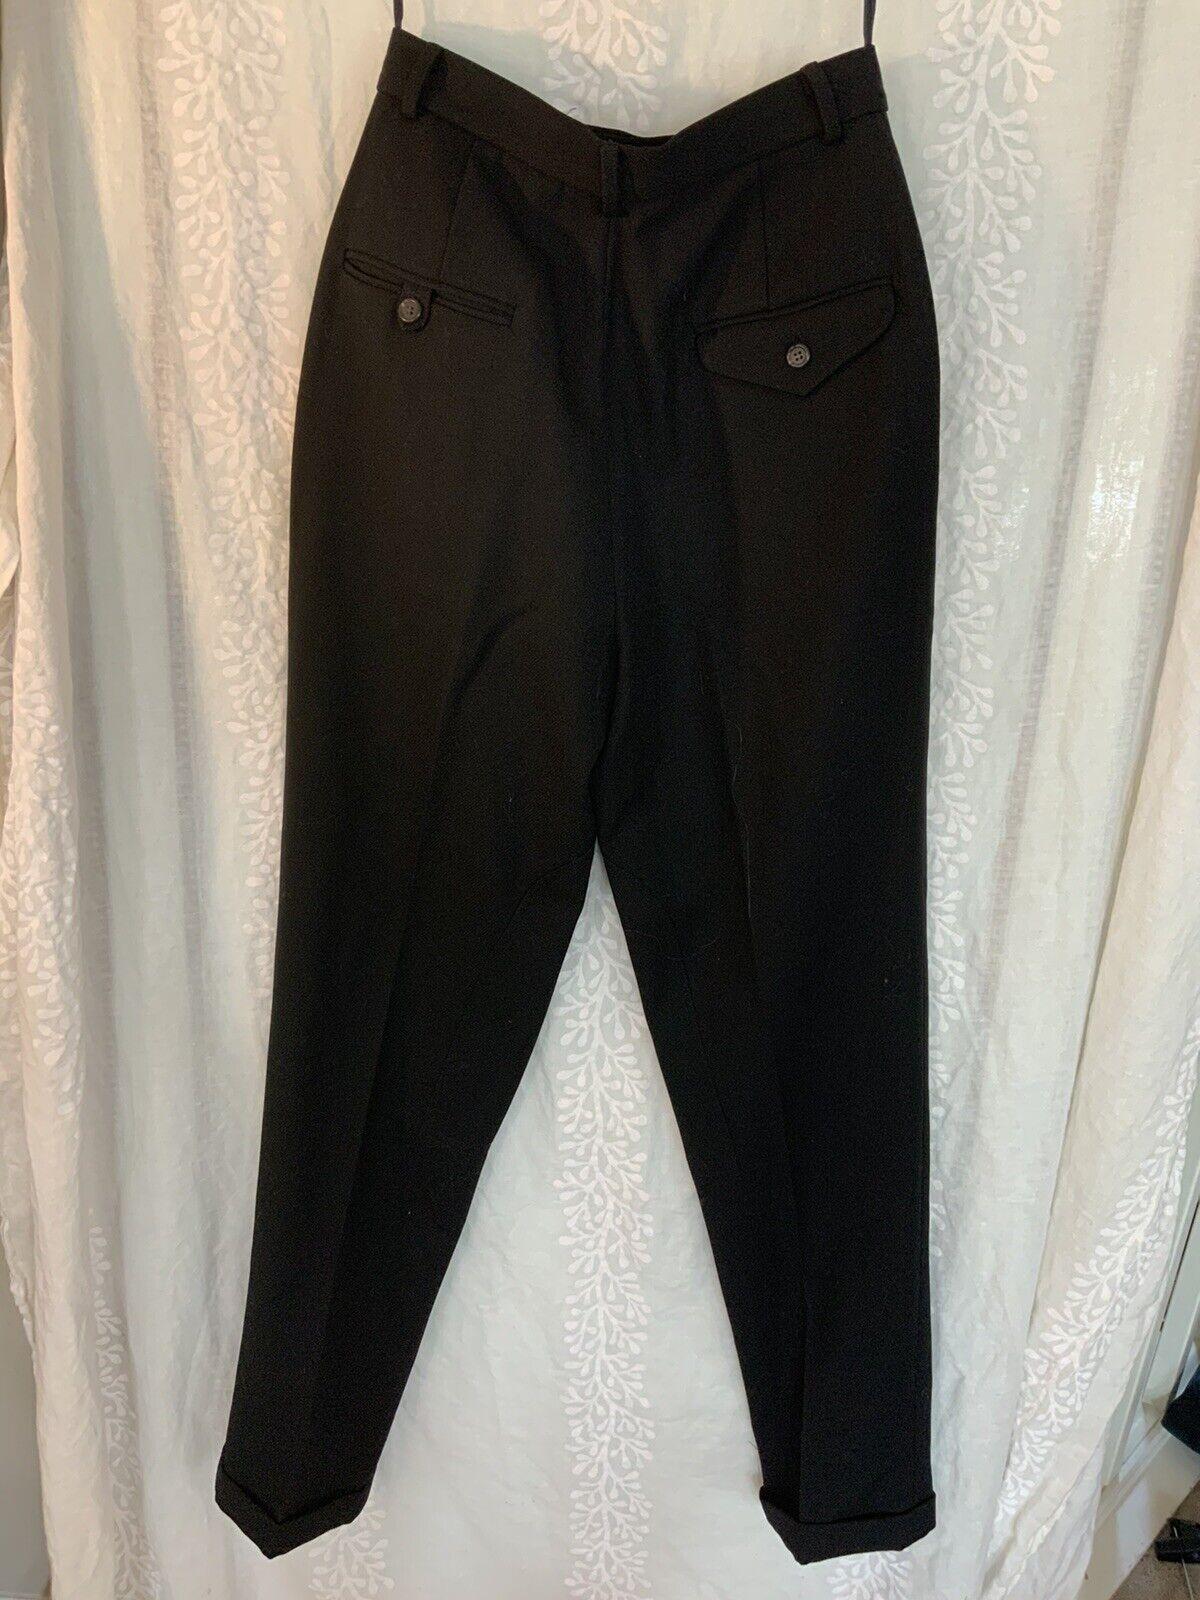 Vintage Ralph Lauren pants black 80s 90s - image 5